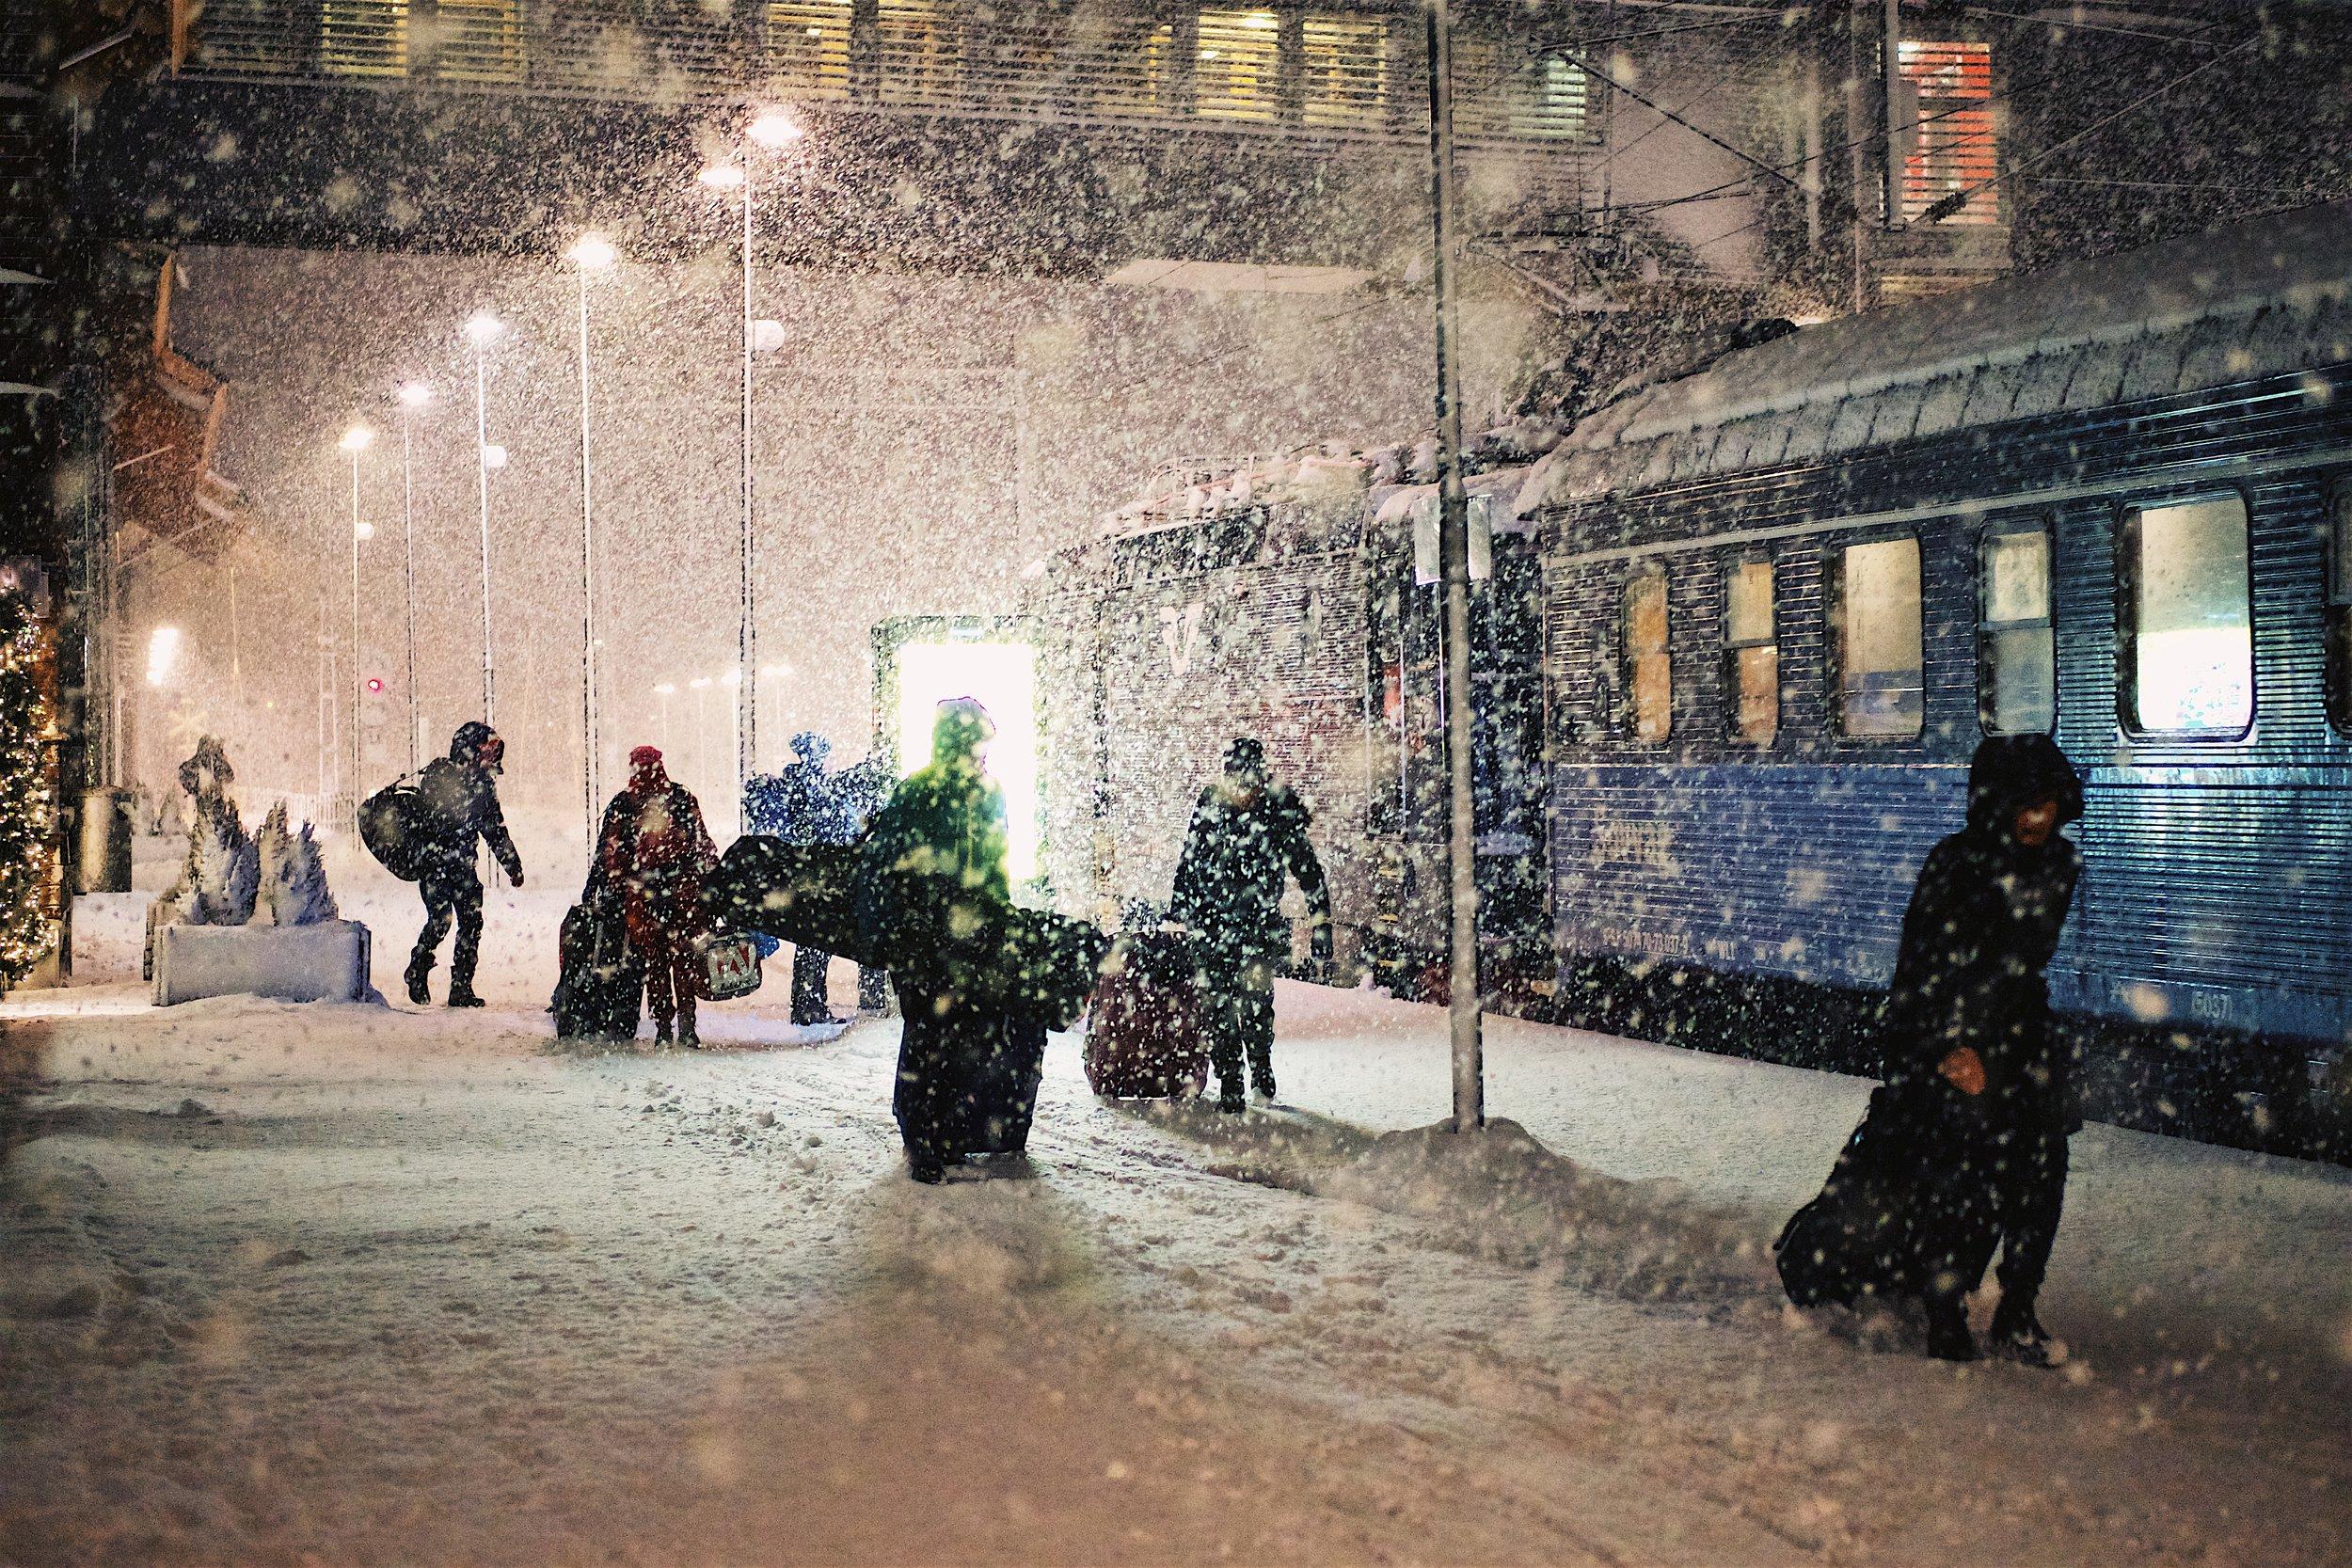 Åre Train Station - Fuji Xpro1 35MM